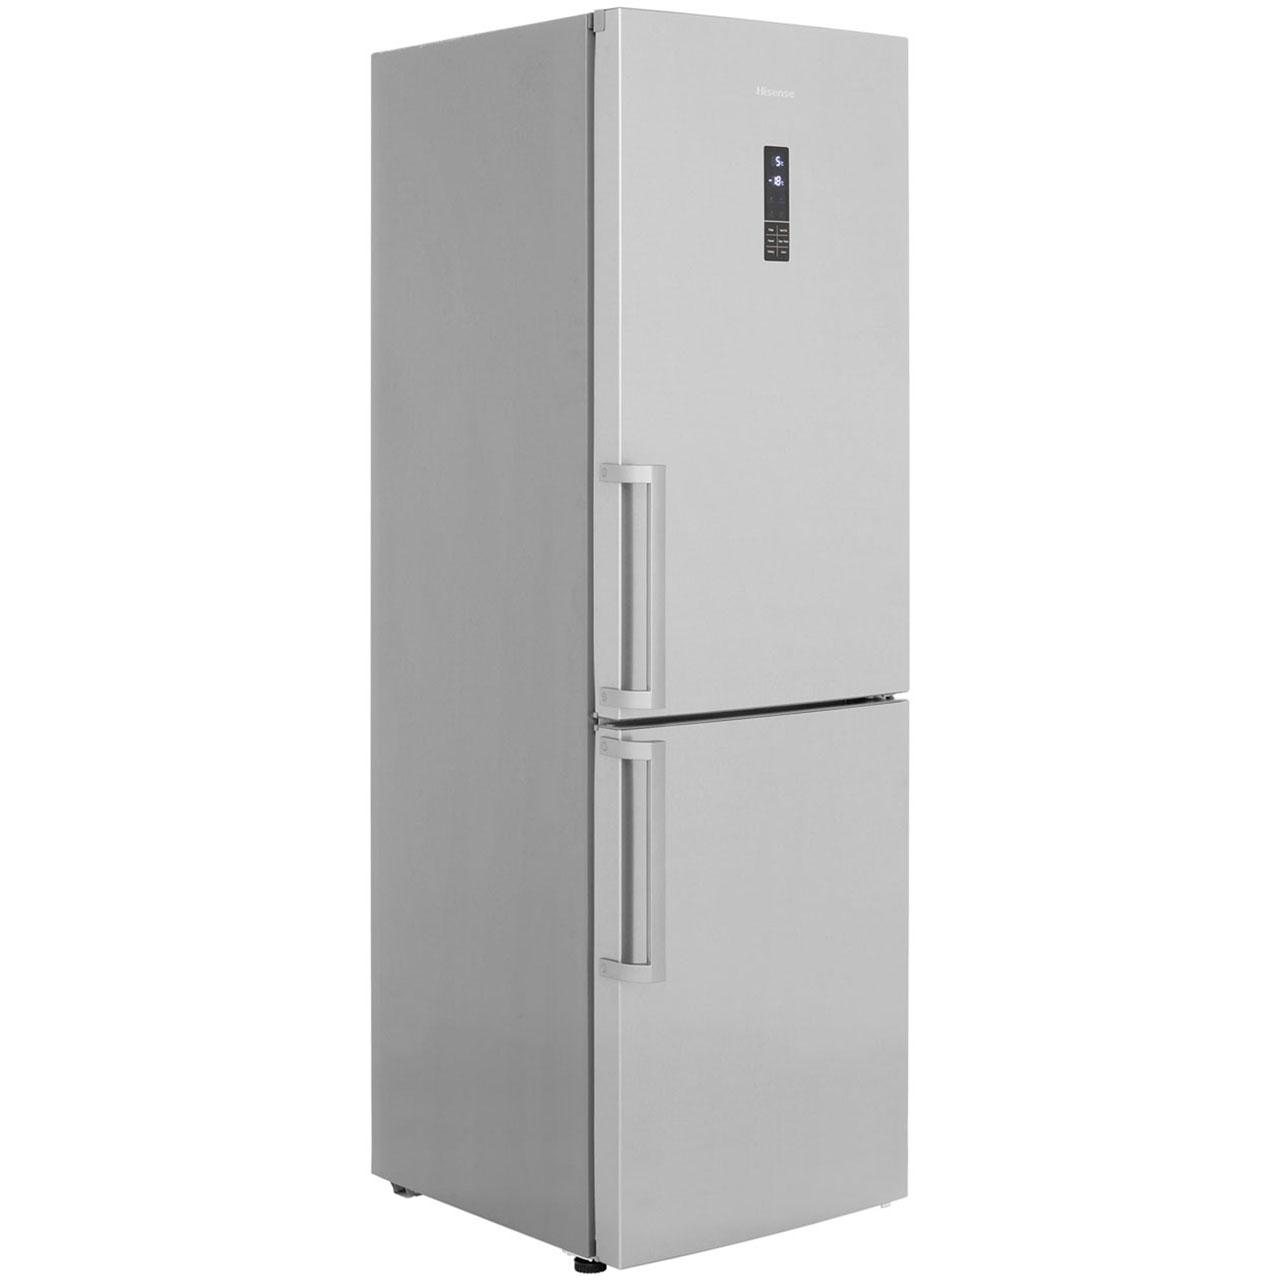 Stainless Steel Refrigerator Handle Bindu Bhatia Astrology